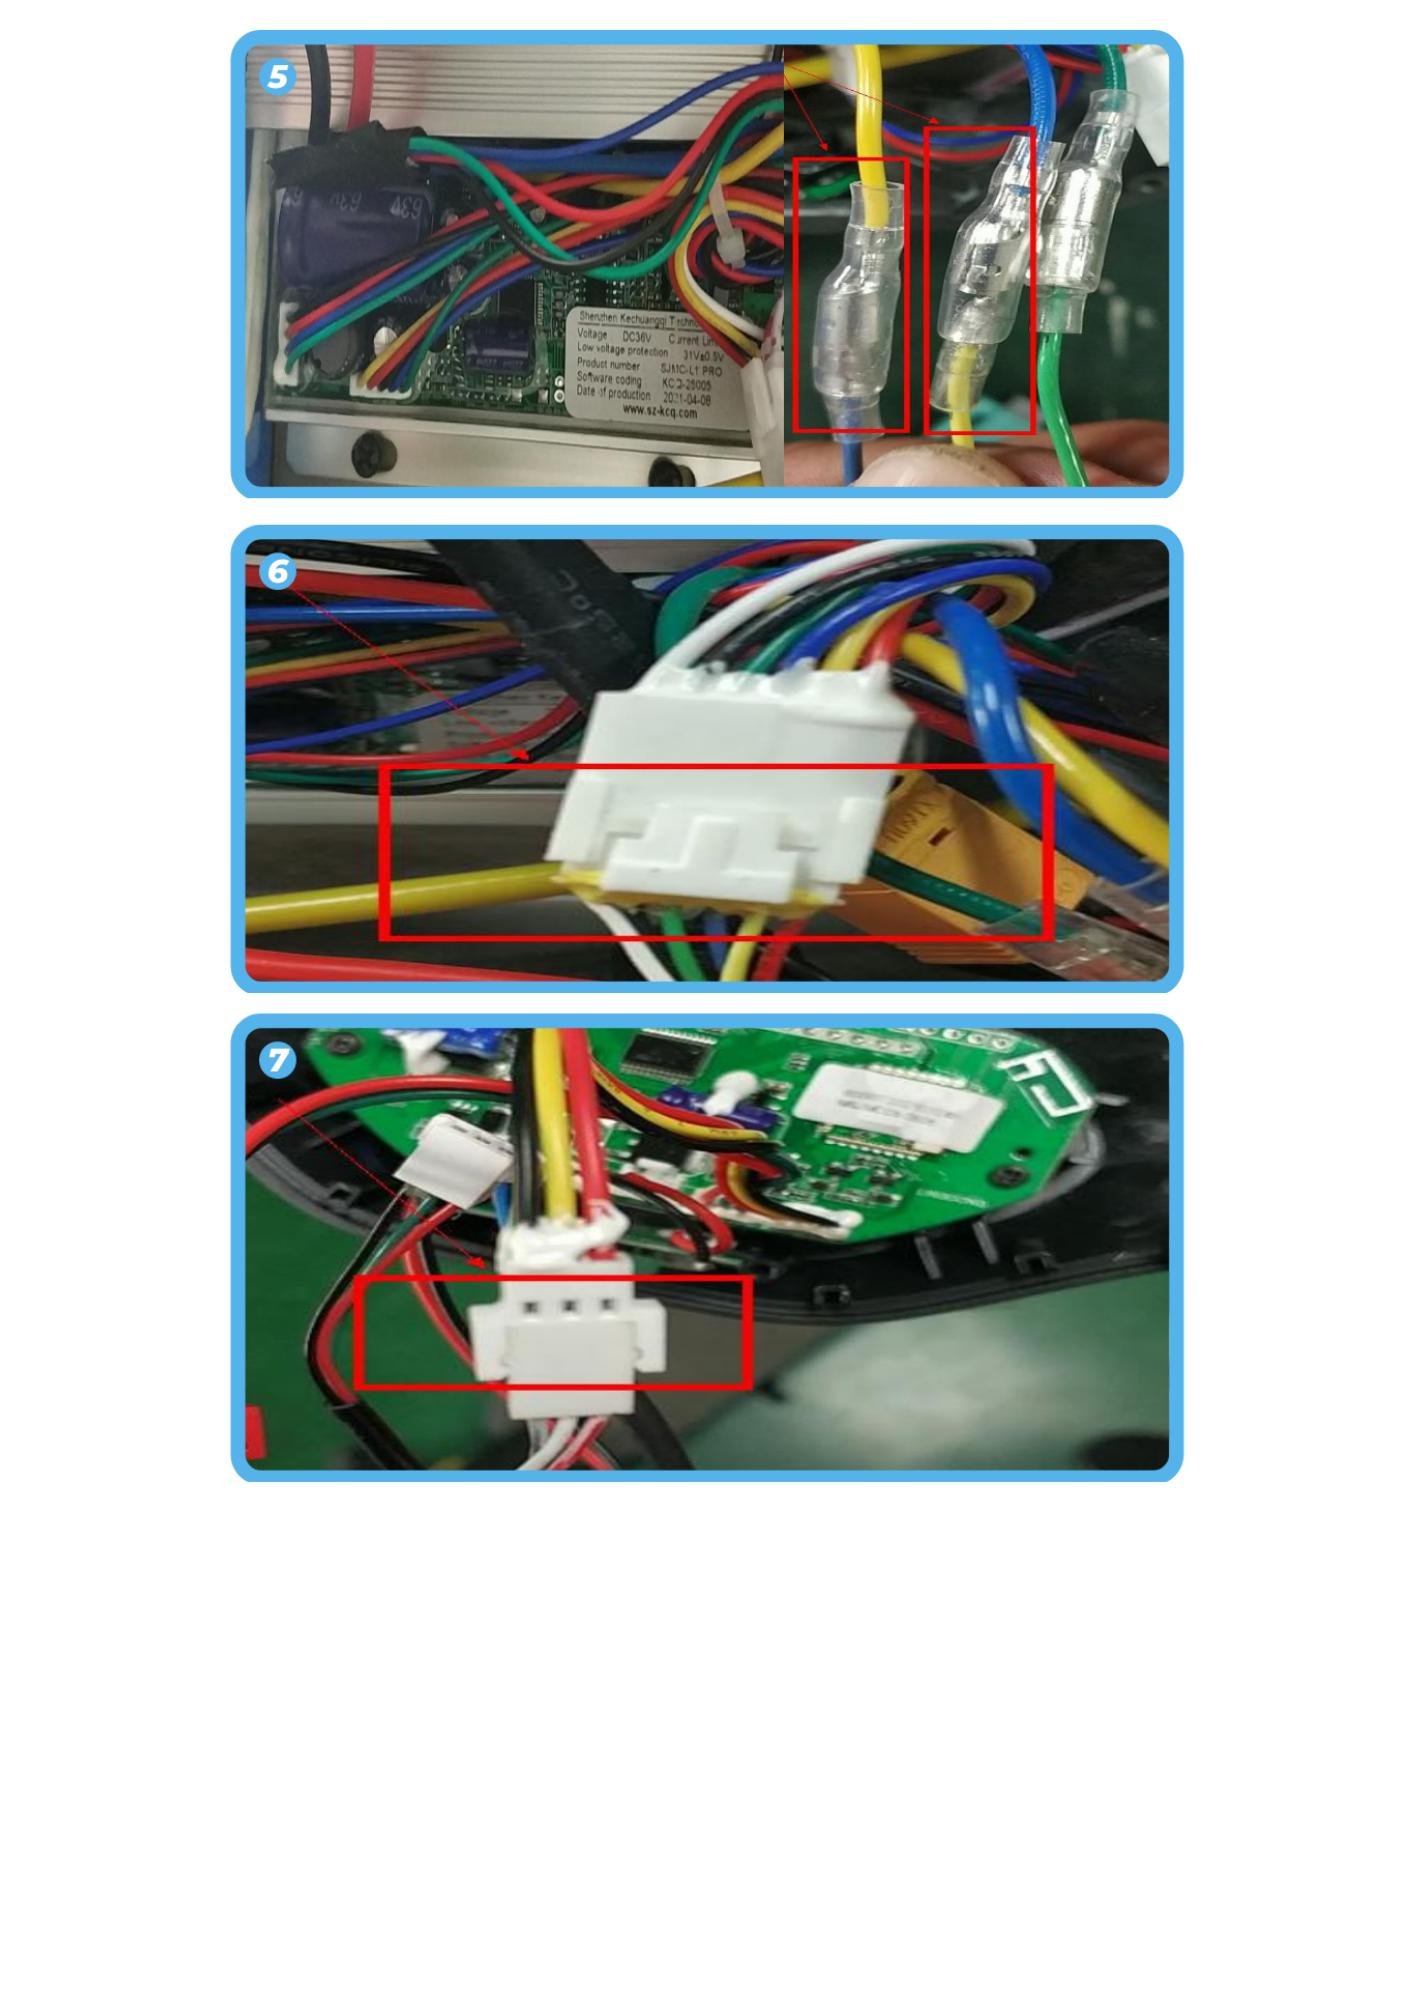 2 6 - Reid ® - eScooters FAQ